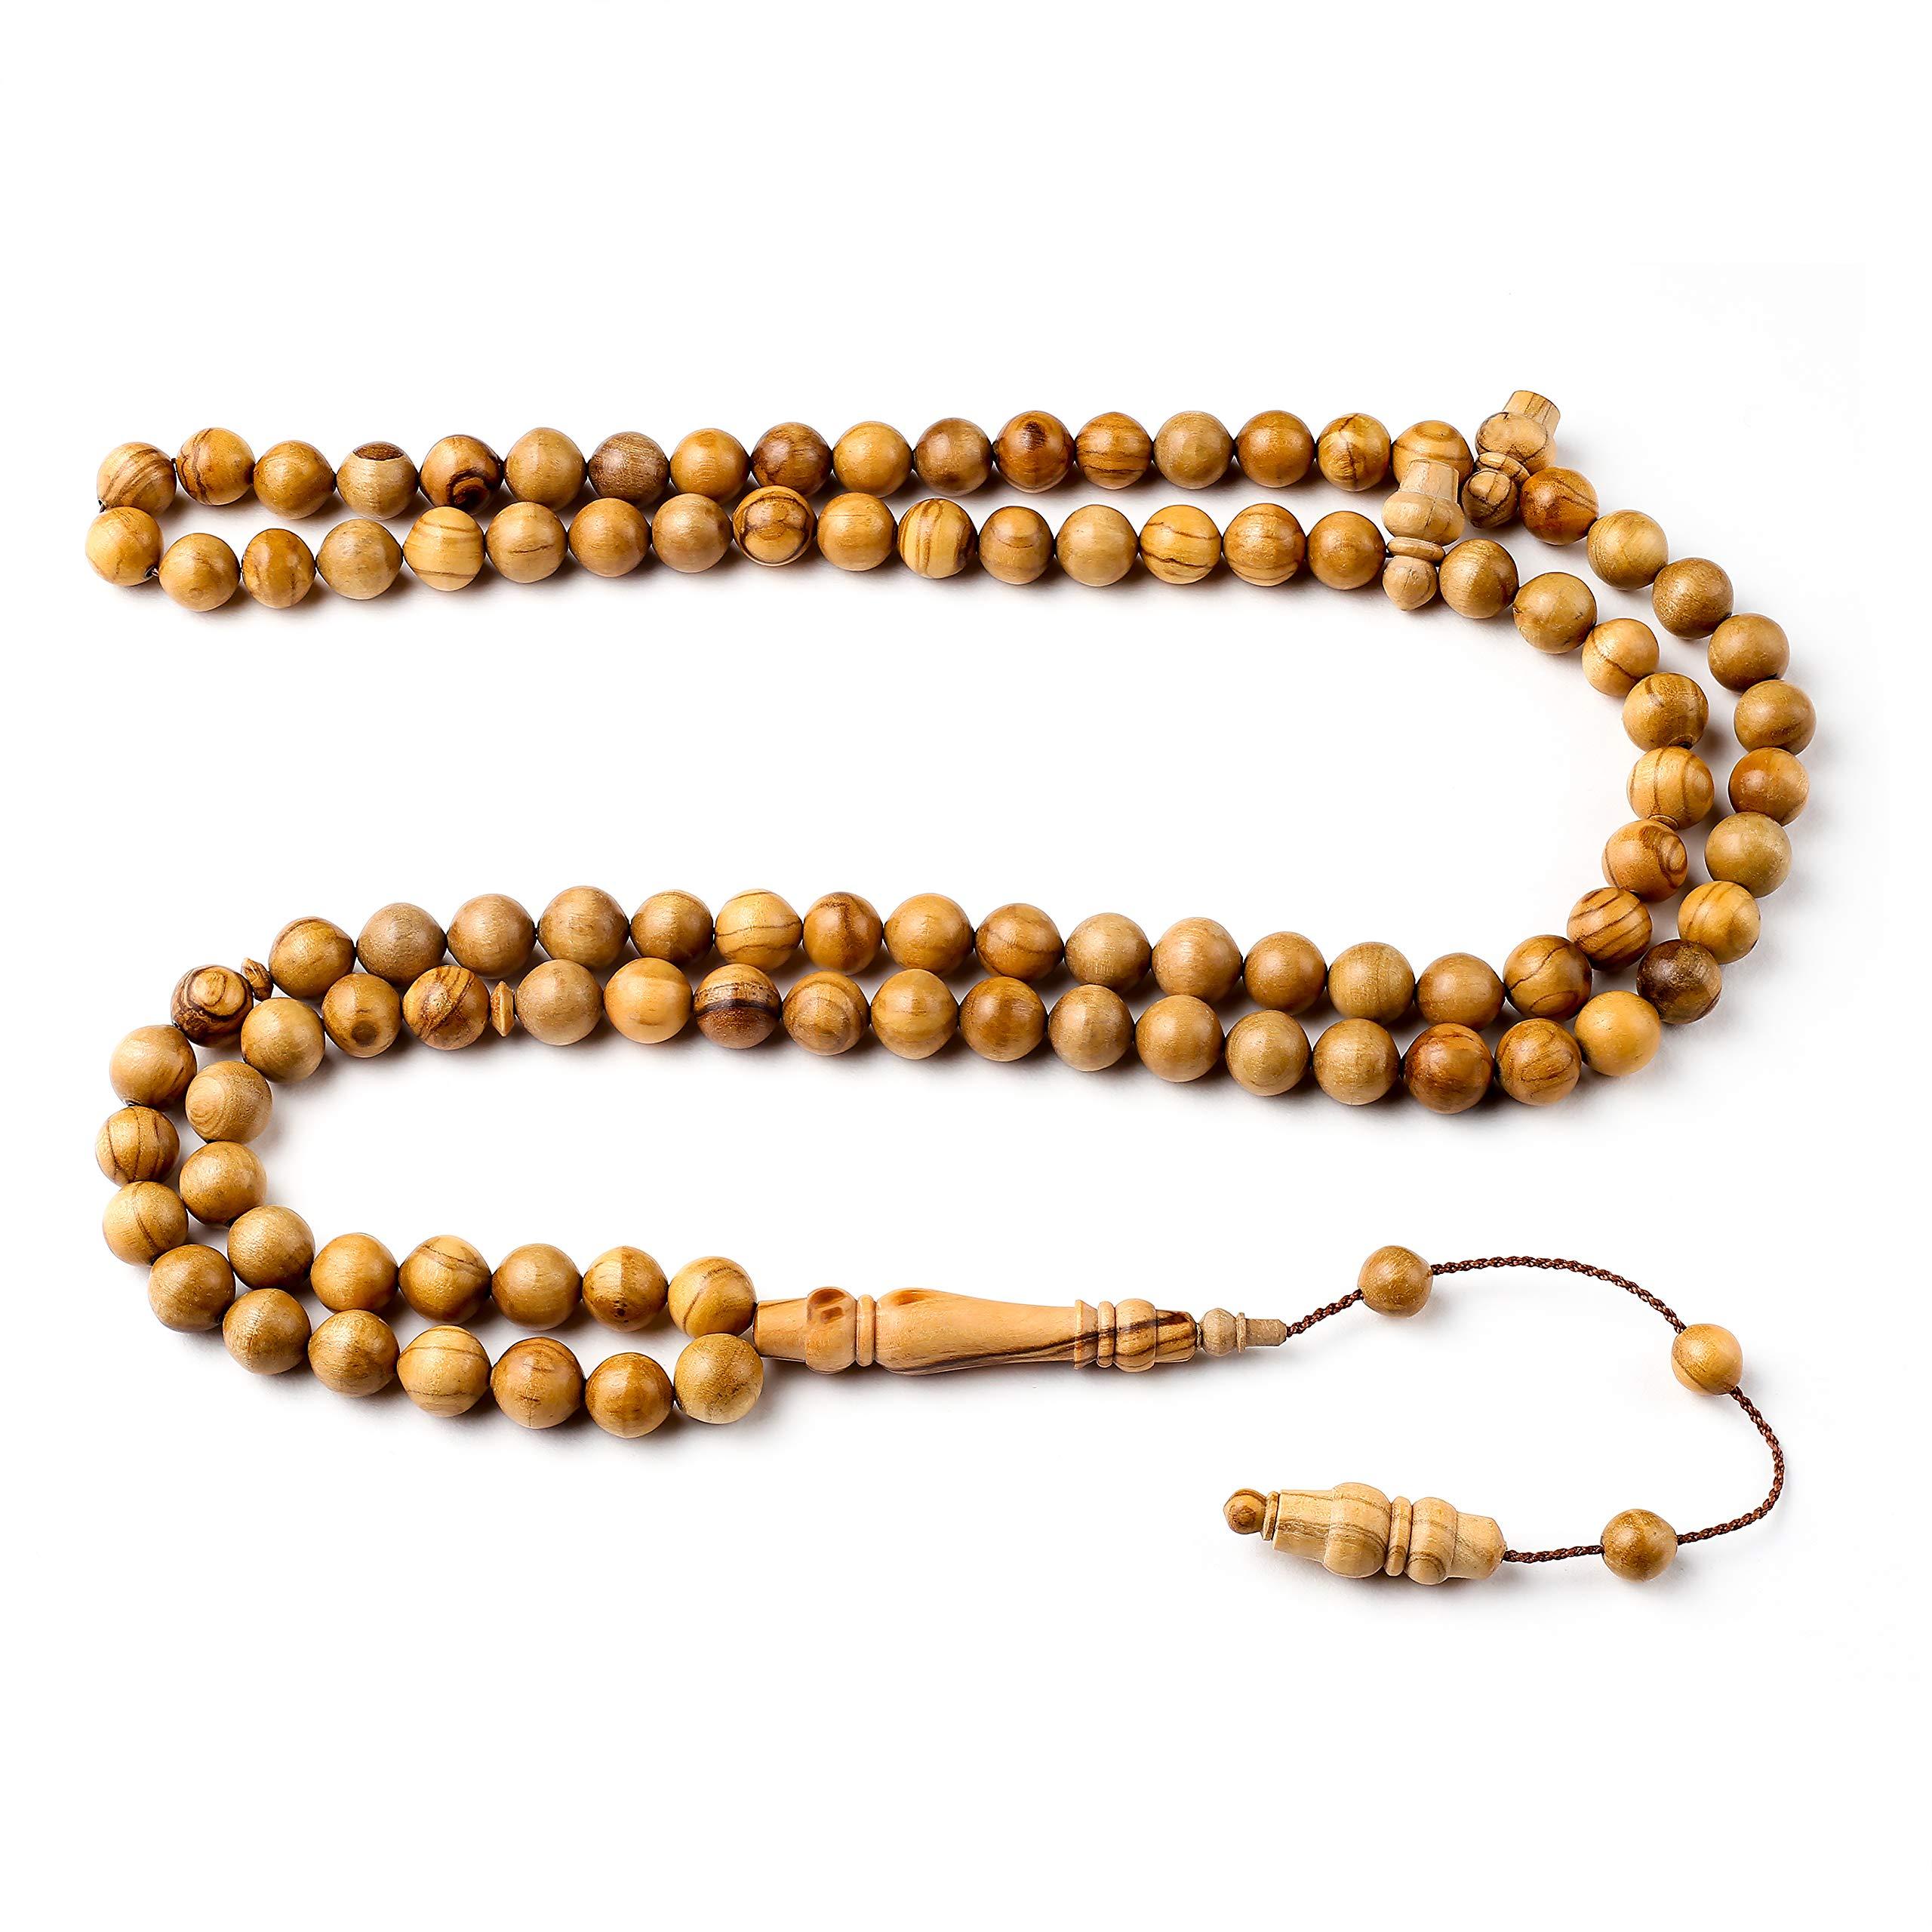 Handcrafted 10mm Blessed Olive Wood Premium Islamic Prayer Beads- INFINITYBEADS by BasmalaBeads- Tesbih- Tasbih- Sibha- Islamic Art